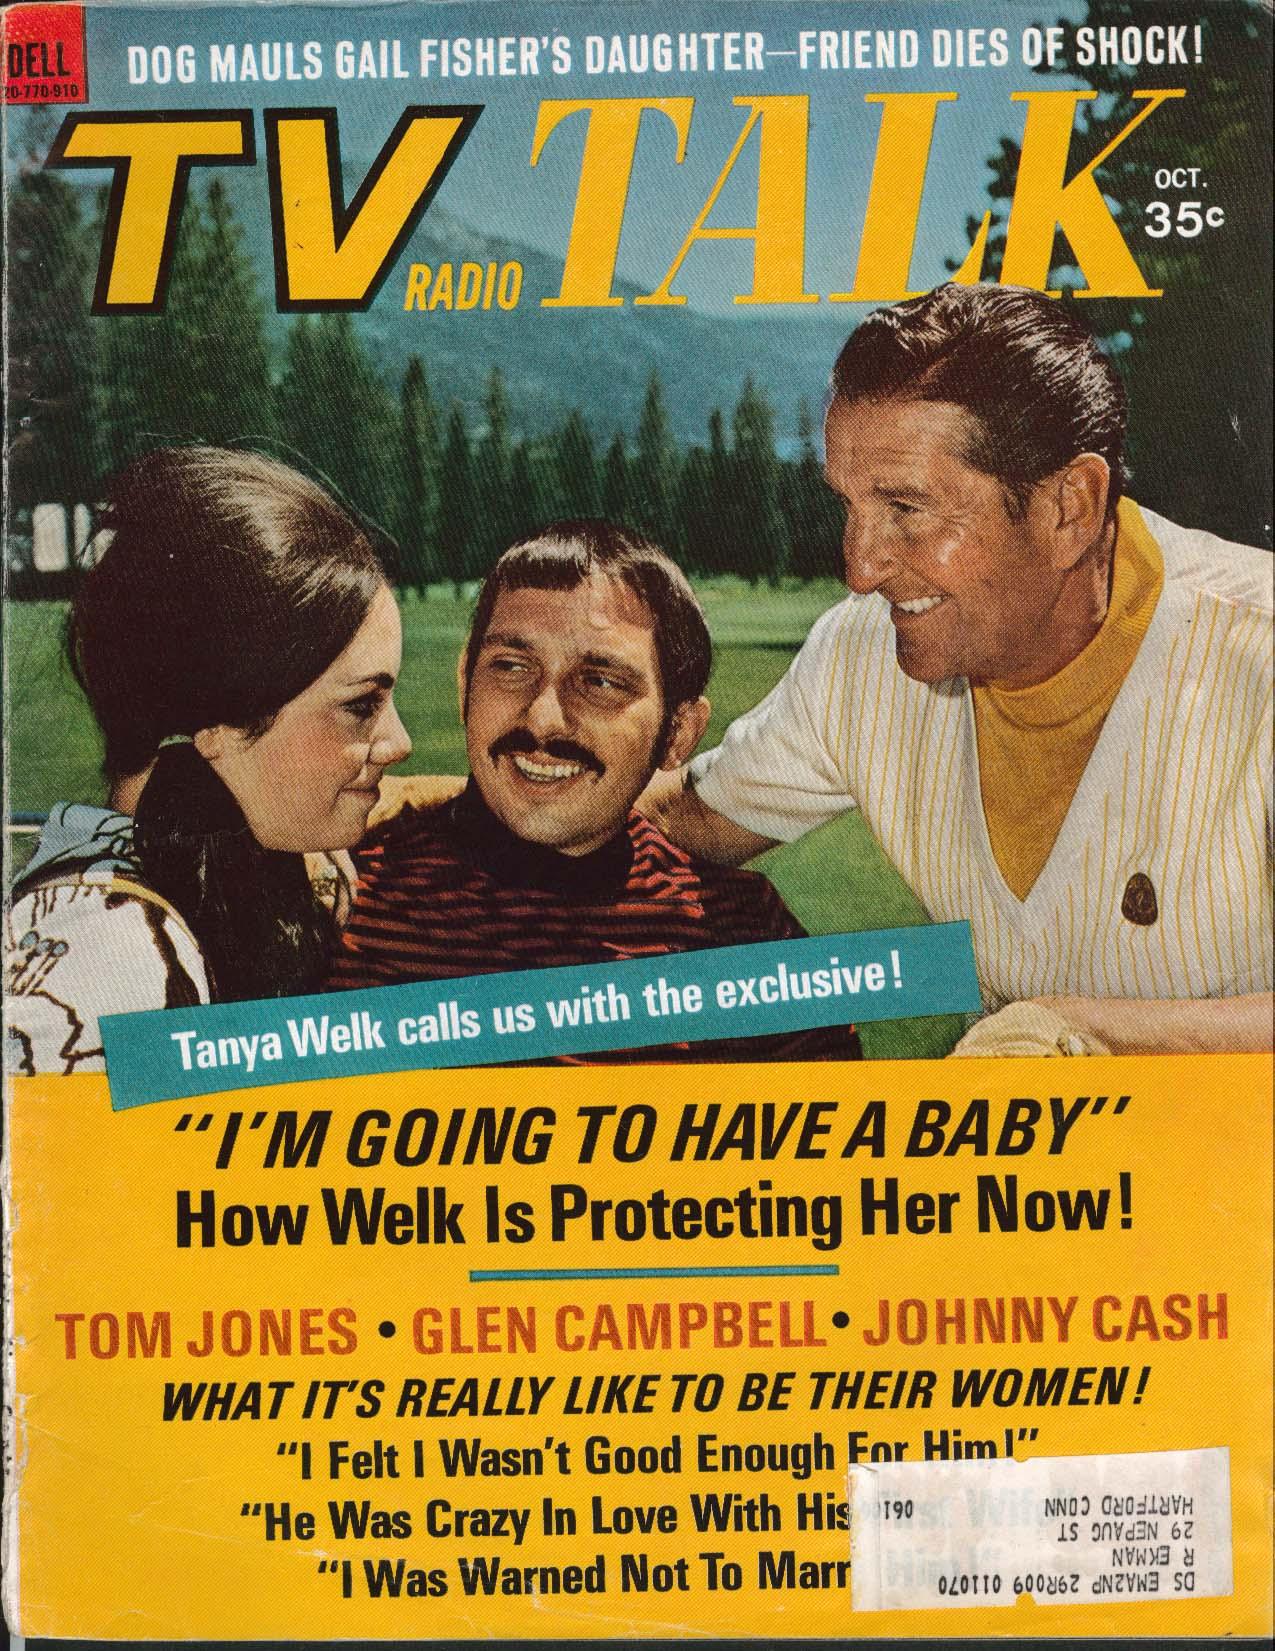 TV RADIO TALK Tanya Welk Tom Jomes Glen Campbell Johnny Cash 10 1969